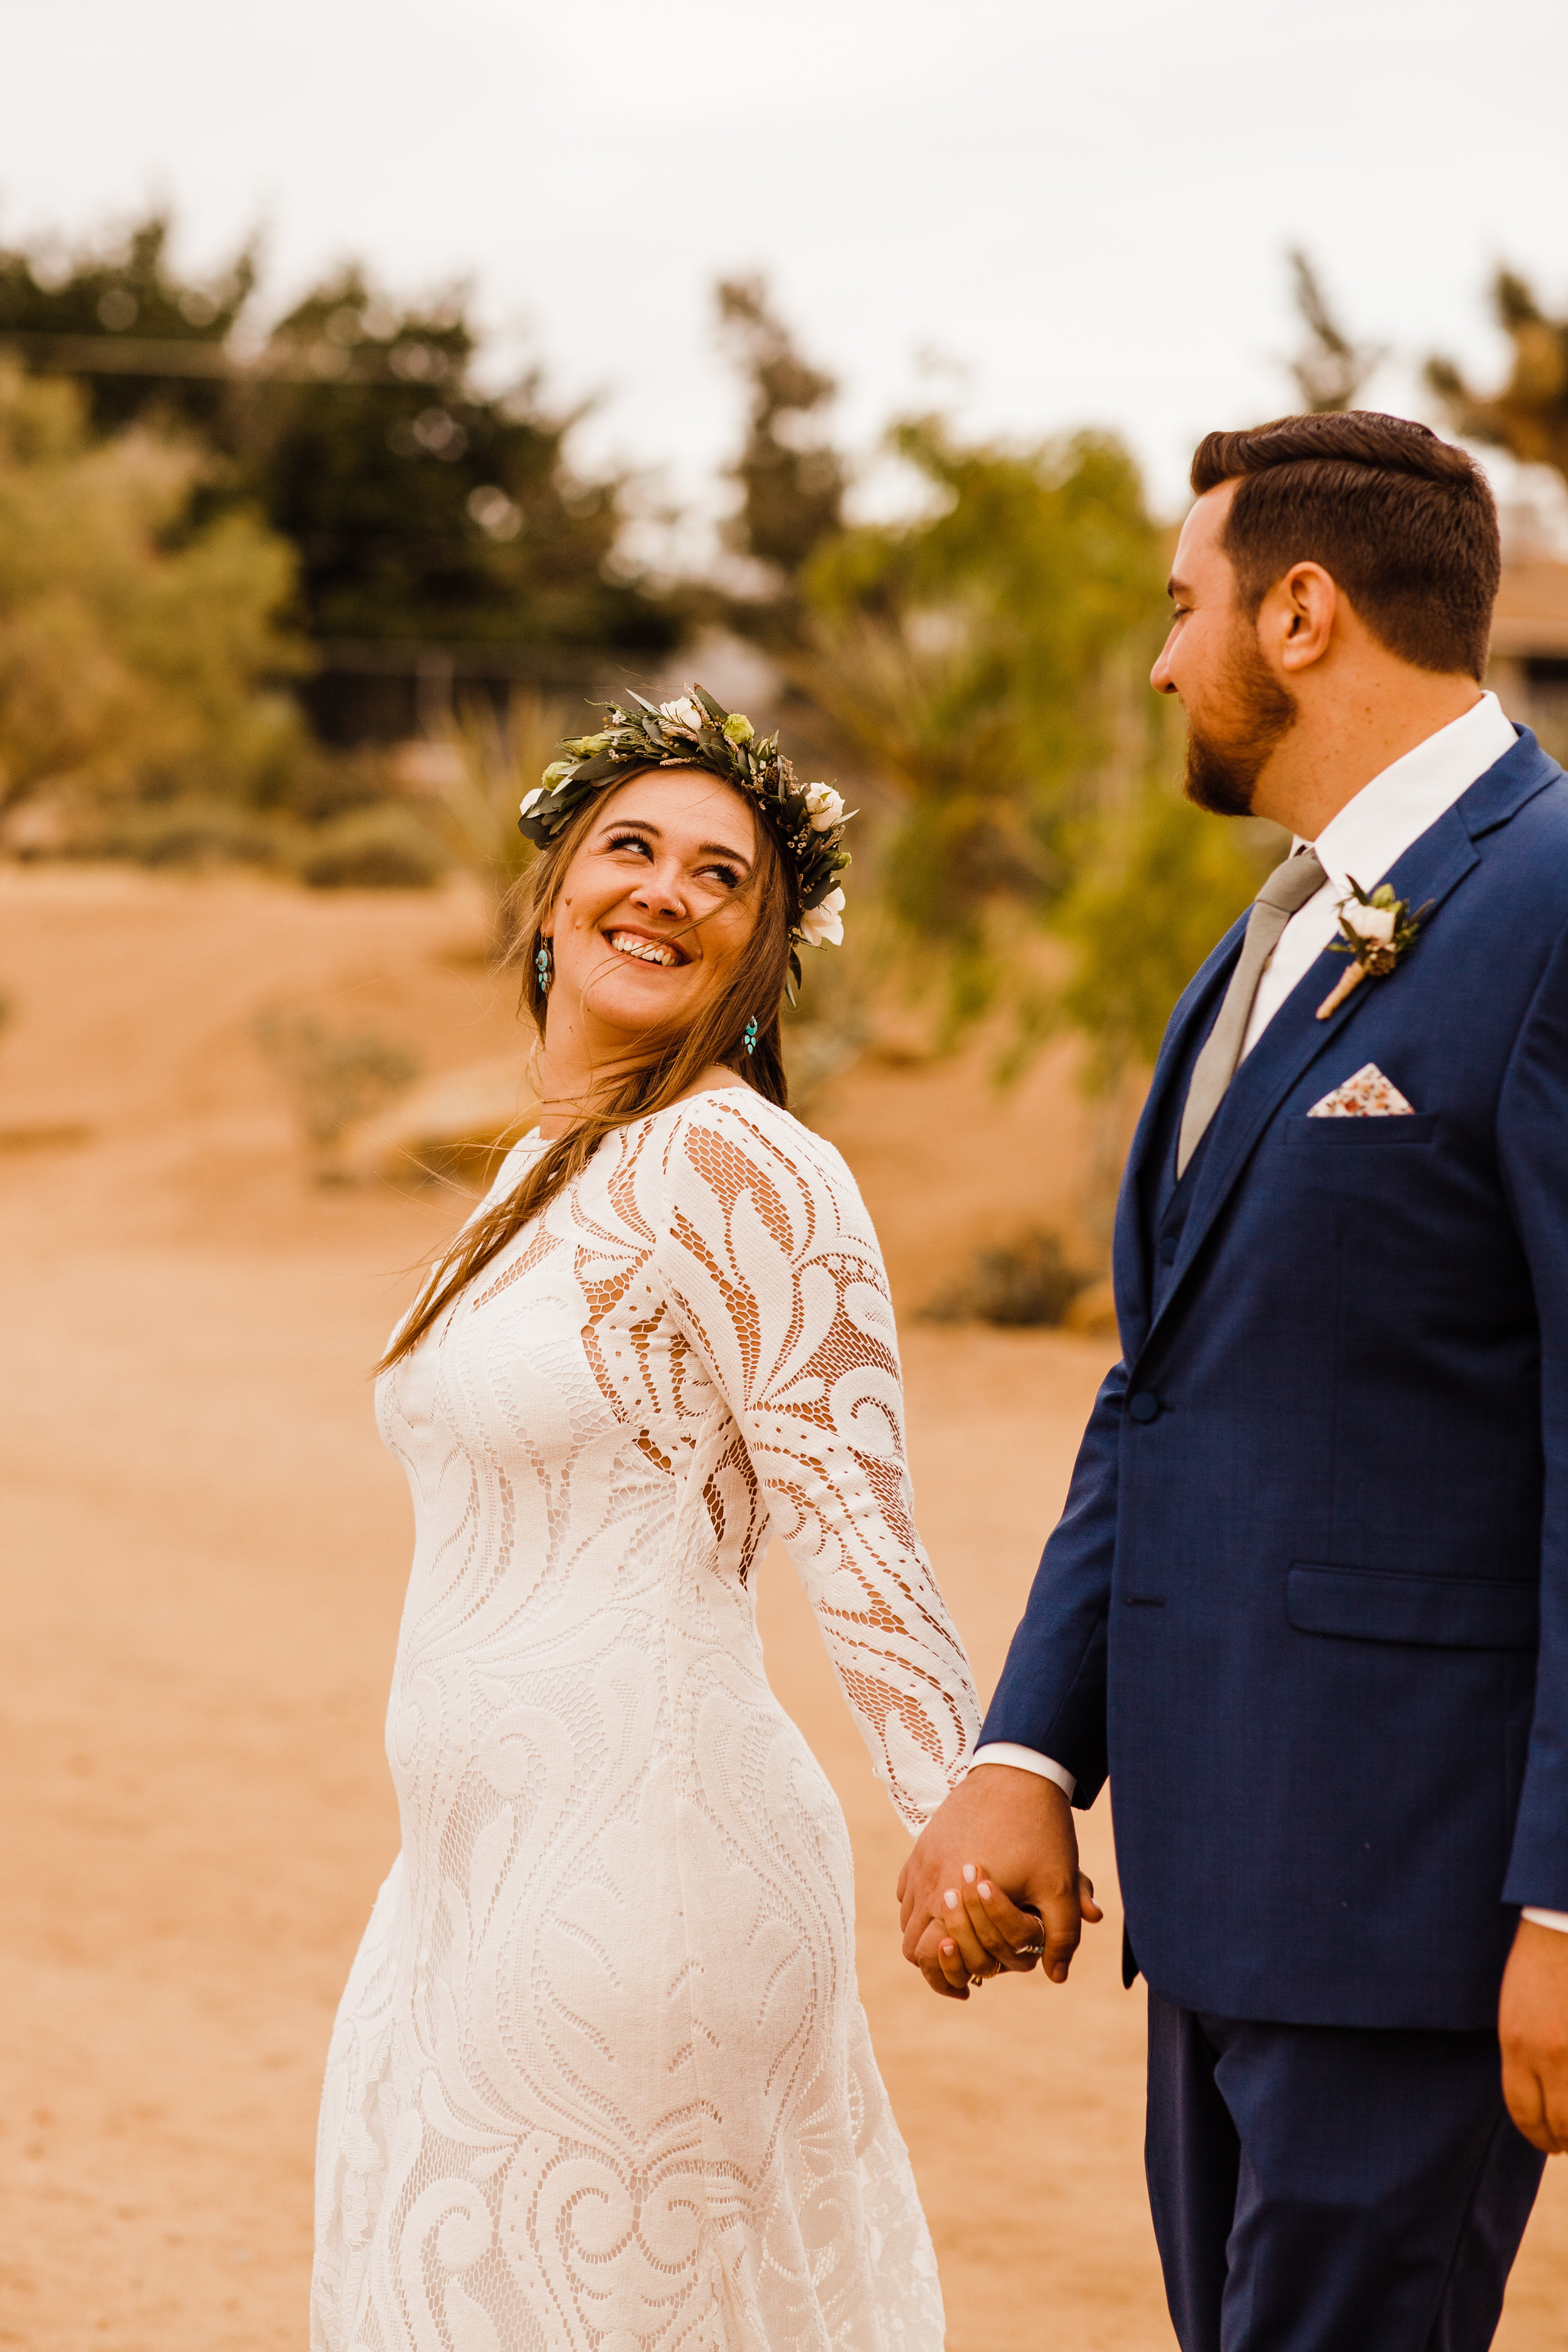 Tumbleweed Sanctuary Wedding - Joshua Tree, CA - Kristy + Chris couples portraits with Hawaiian flower crown